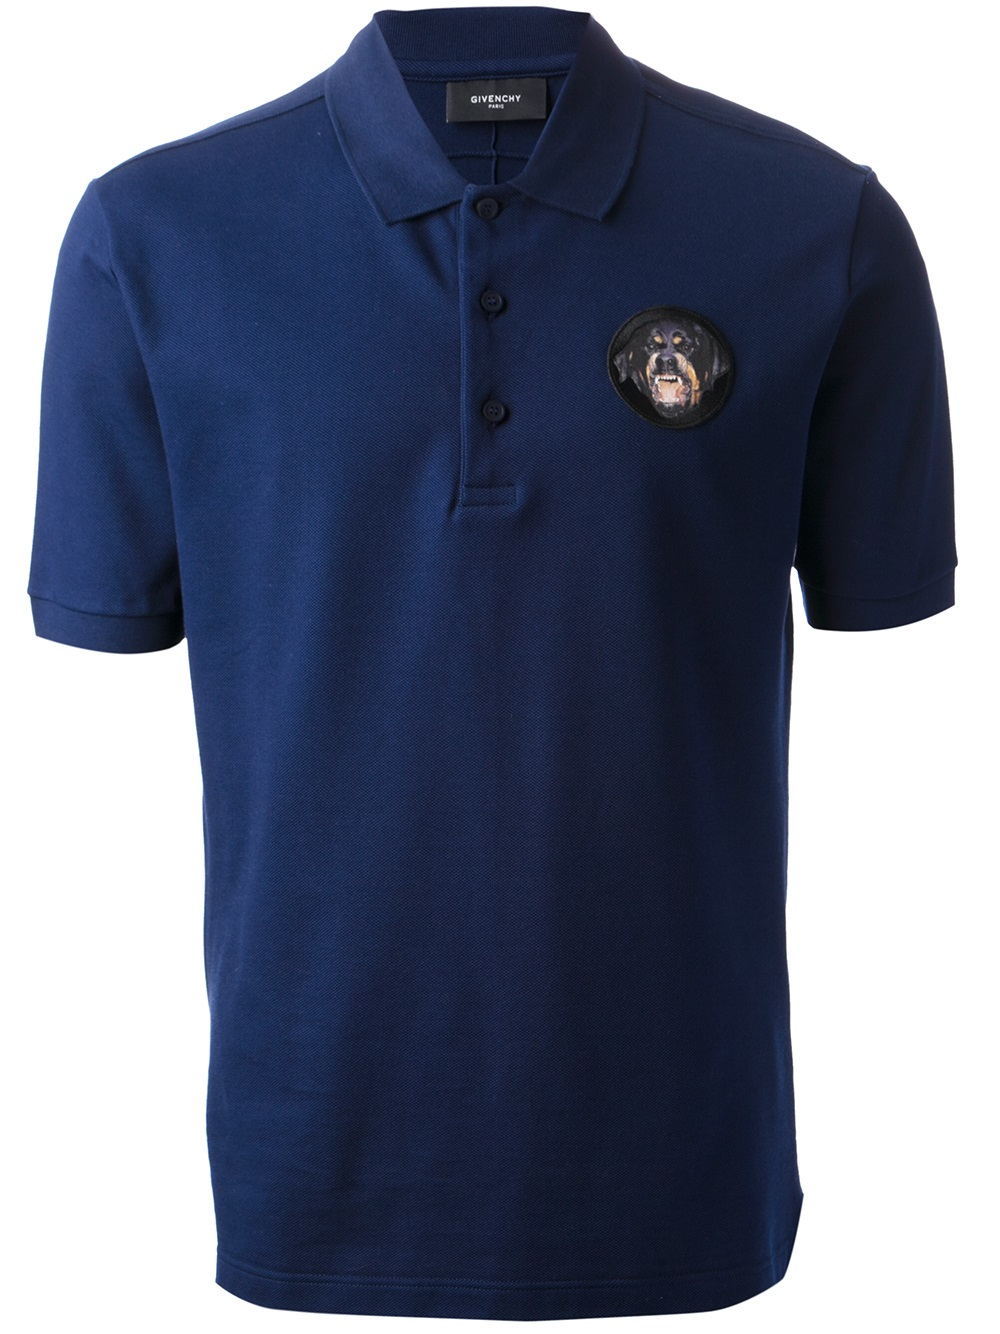 Black Shirt And Dog Collar